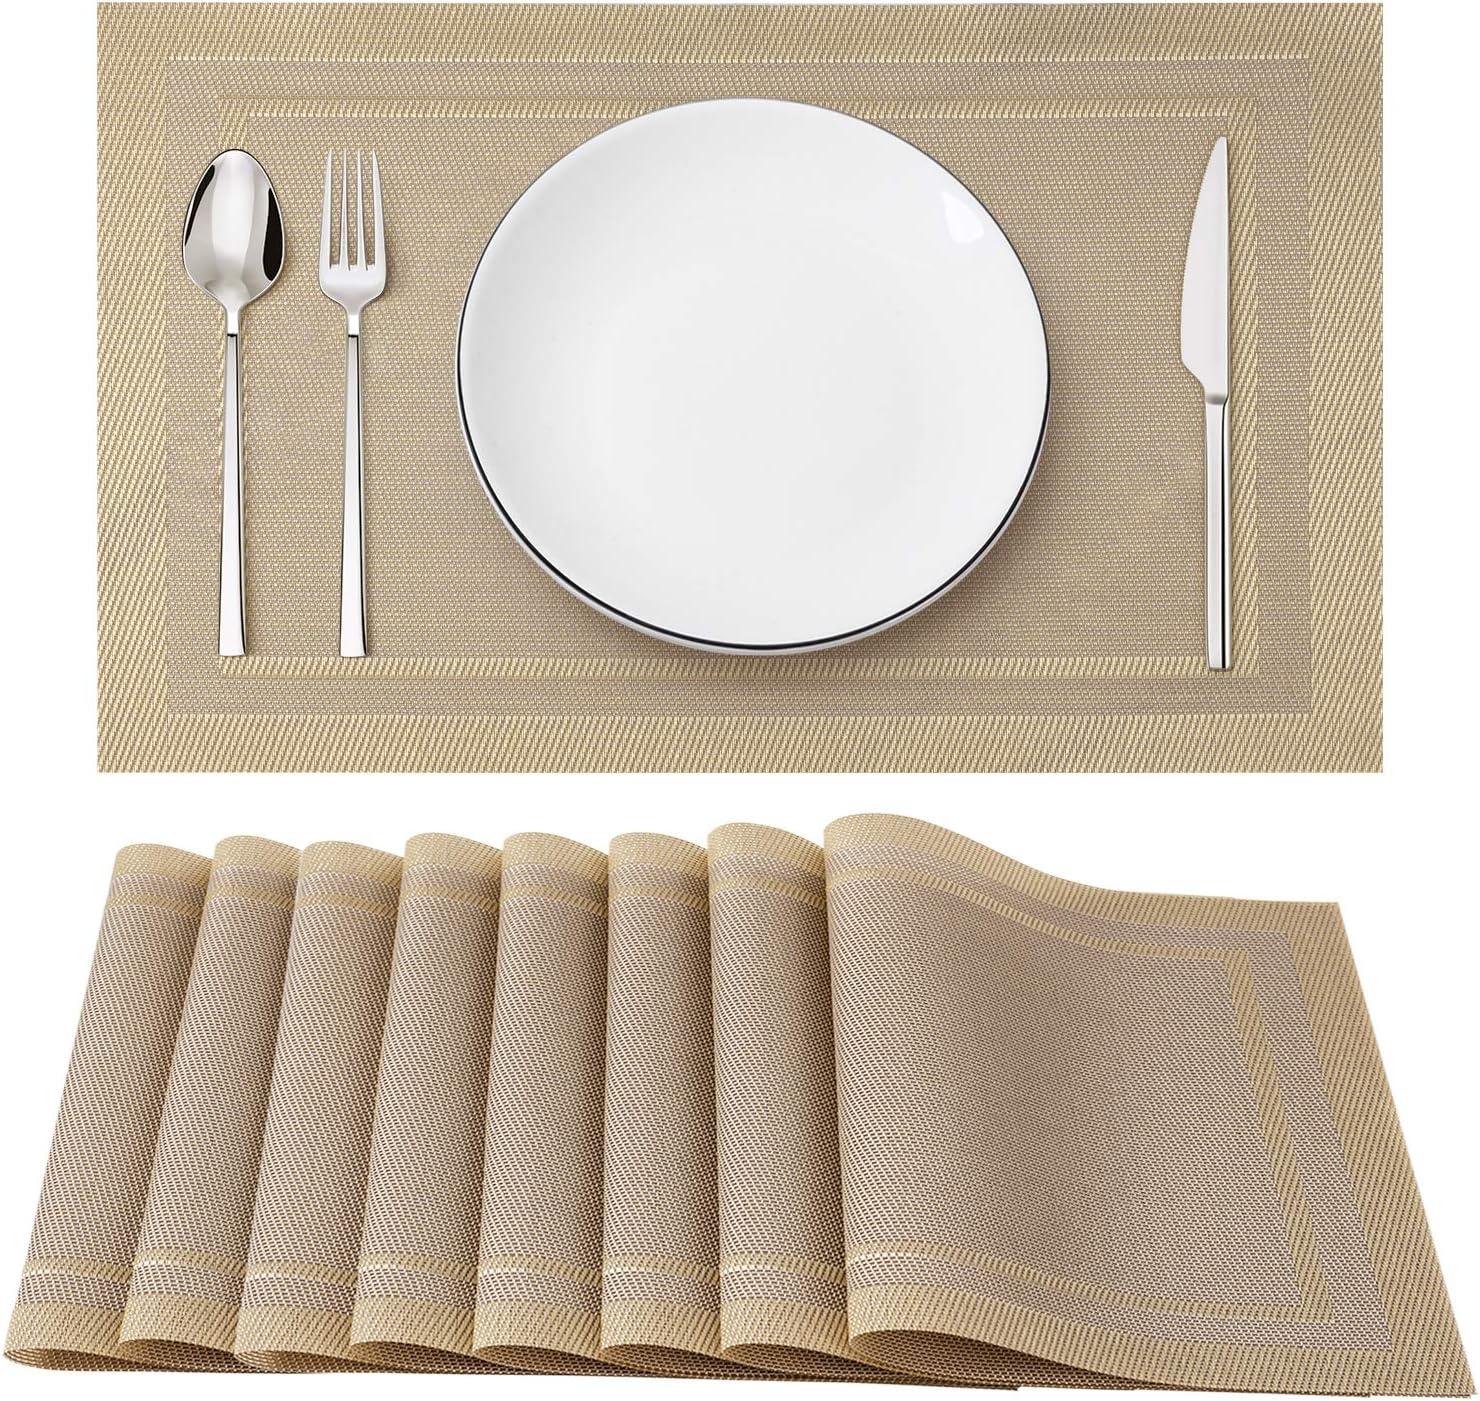 Washable Durable PVC Table Mats Woven Vinyl Placemats Beige White, 8Pcs Set of 8 Heat-Resistant Placemats Stain Resistant Anti-Skid Placemats for Kitchen Table SD SENDAY Placemats